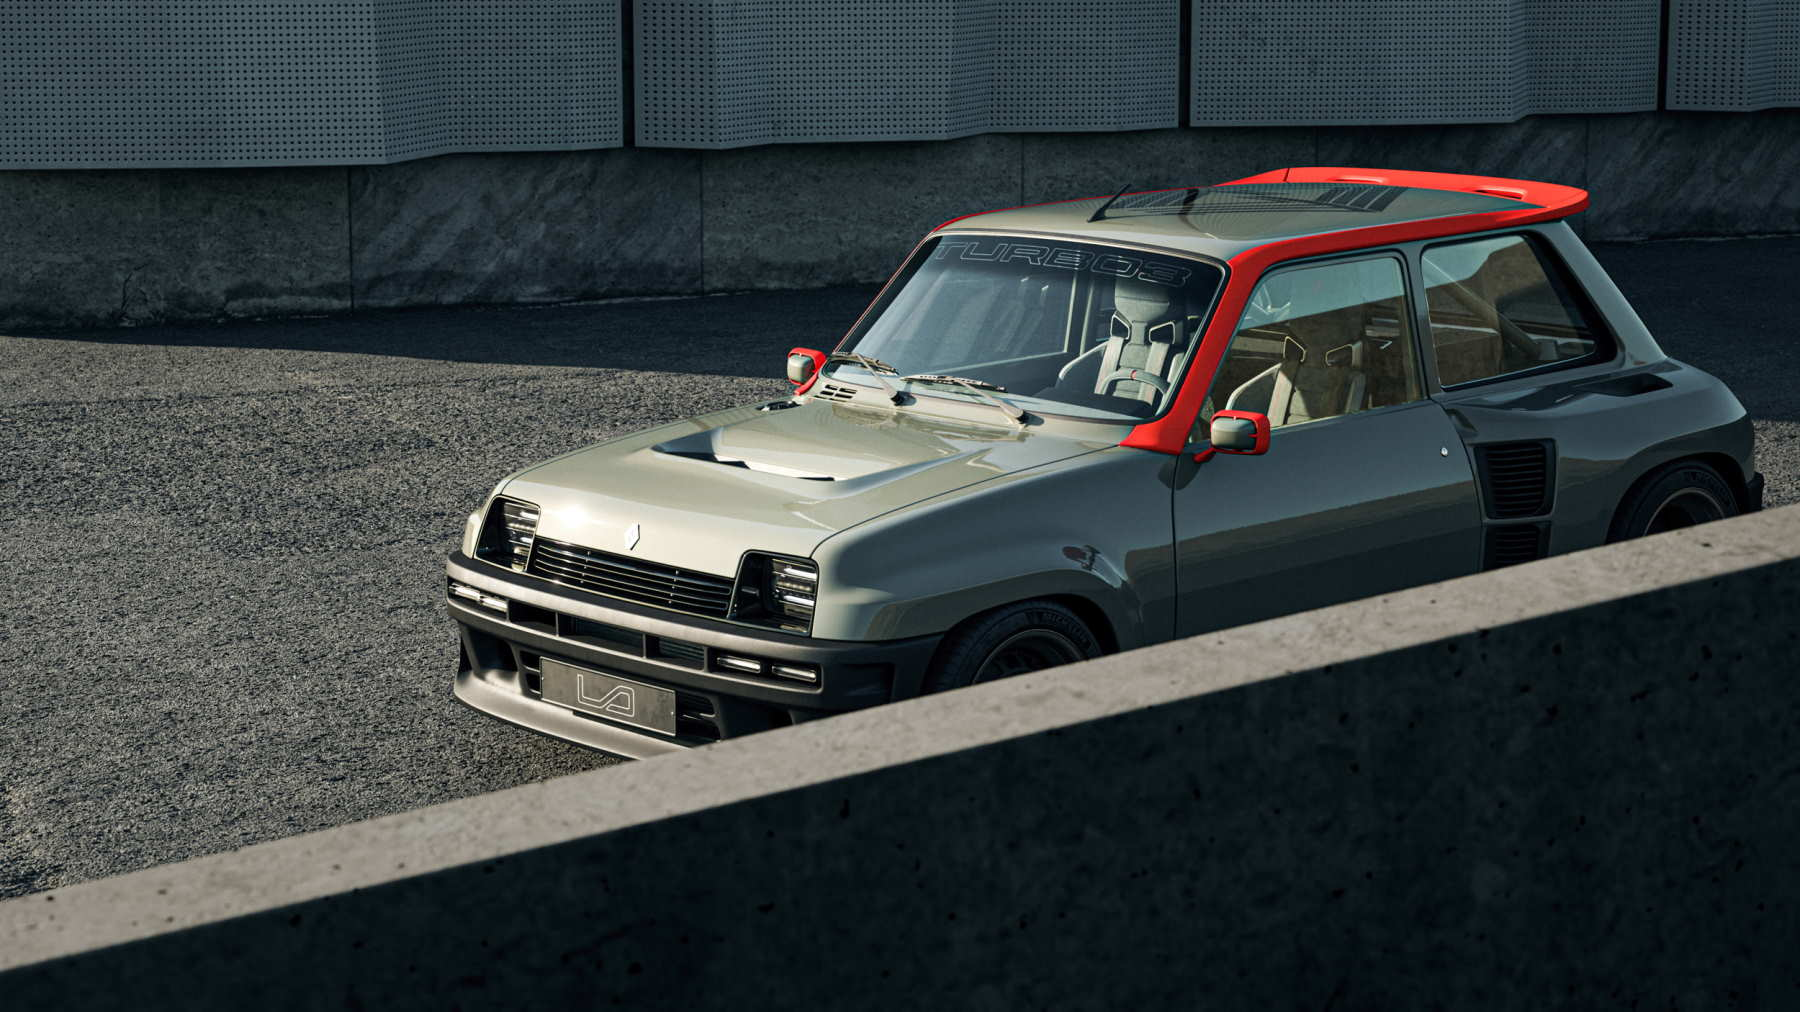 renault 5 turbo 3 restomod della Legende Automobiles